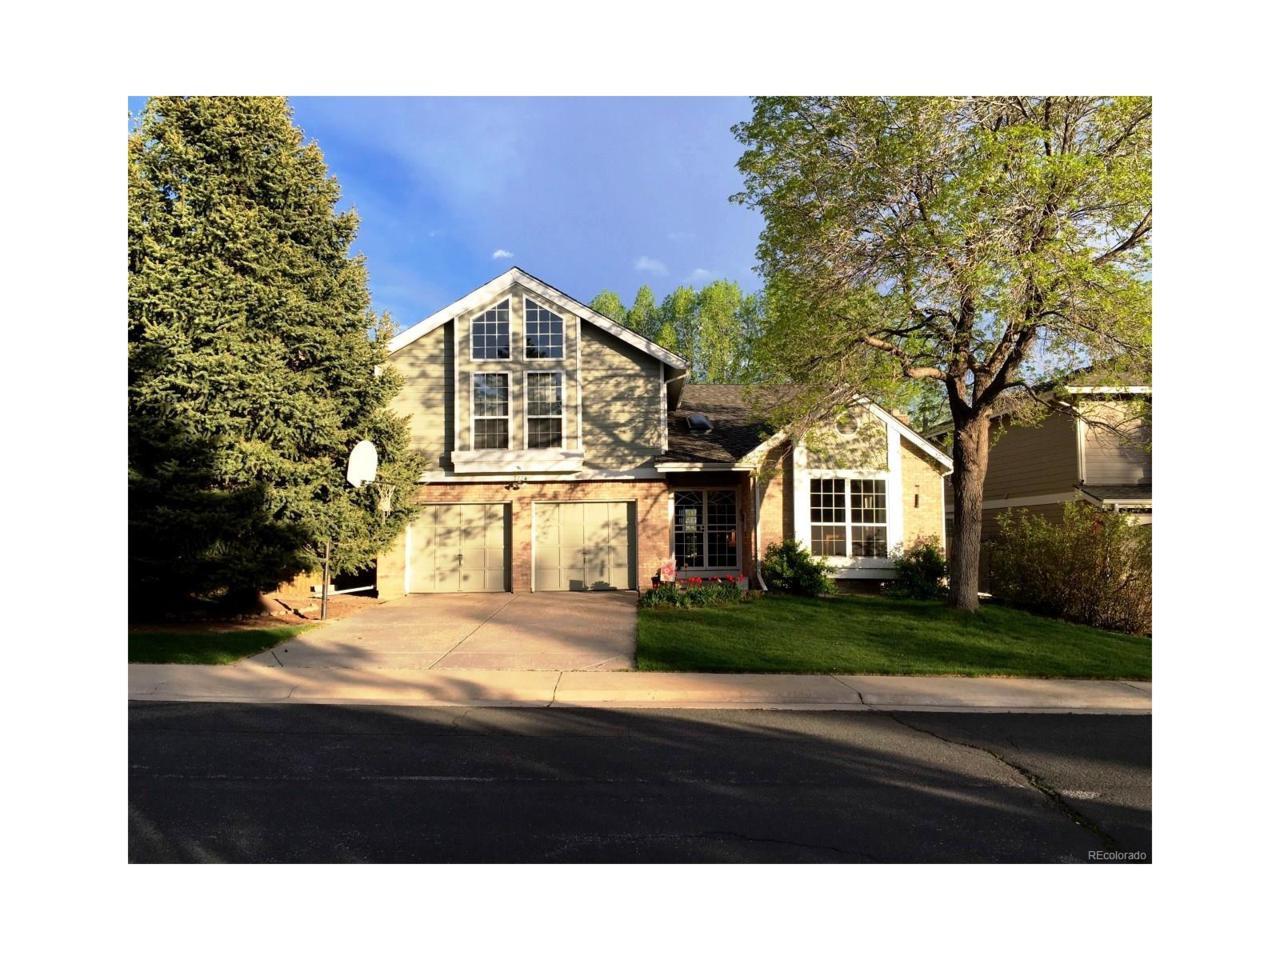 7724 Gunsight Pass, Littleton, CO 80127 (MLS #9736211) :: 8z Real Estate